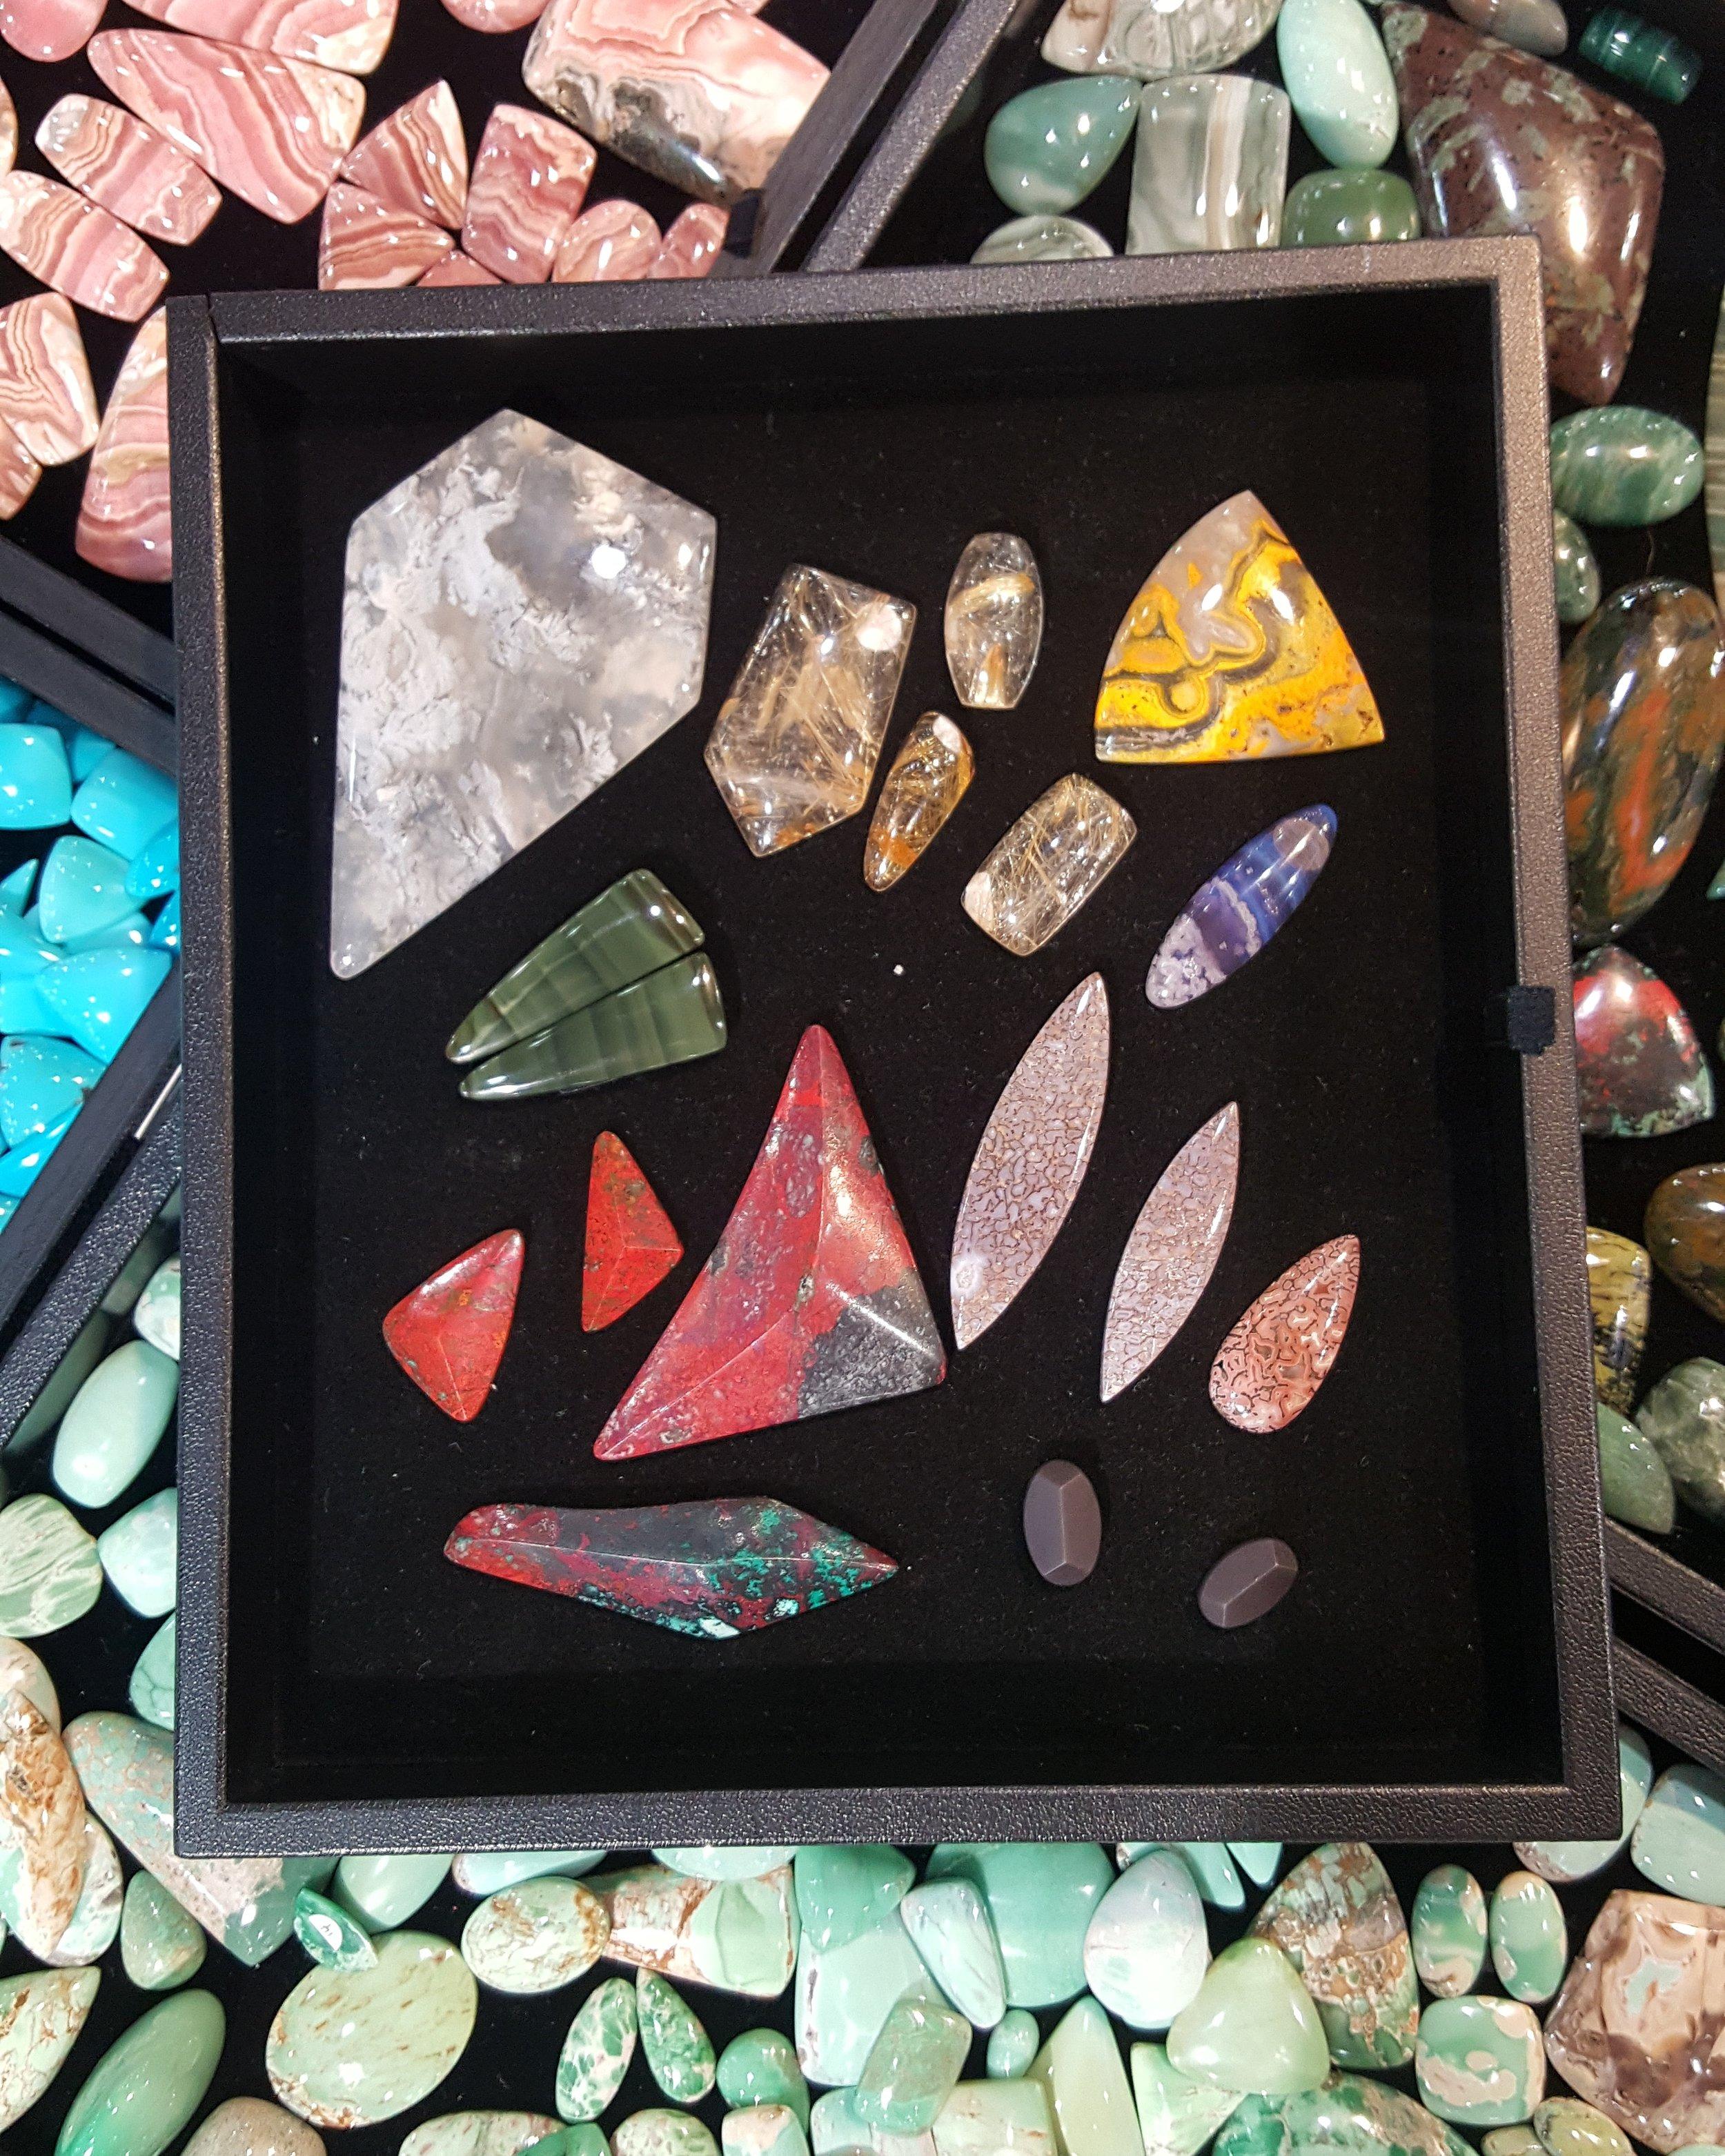 The last time I worked for Gary I came home with these! Sonoran Sunrise, Imperial Jasper, Leland Purple, Gembone (Dino Bone), Moss Agate, Bumblebee Jasper, and Rutilated Quartz